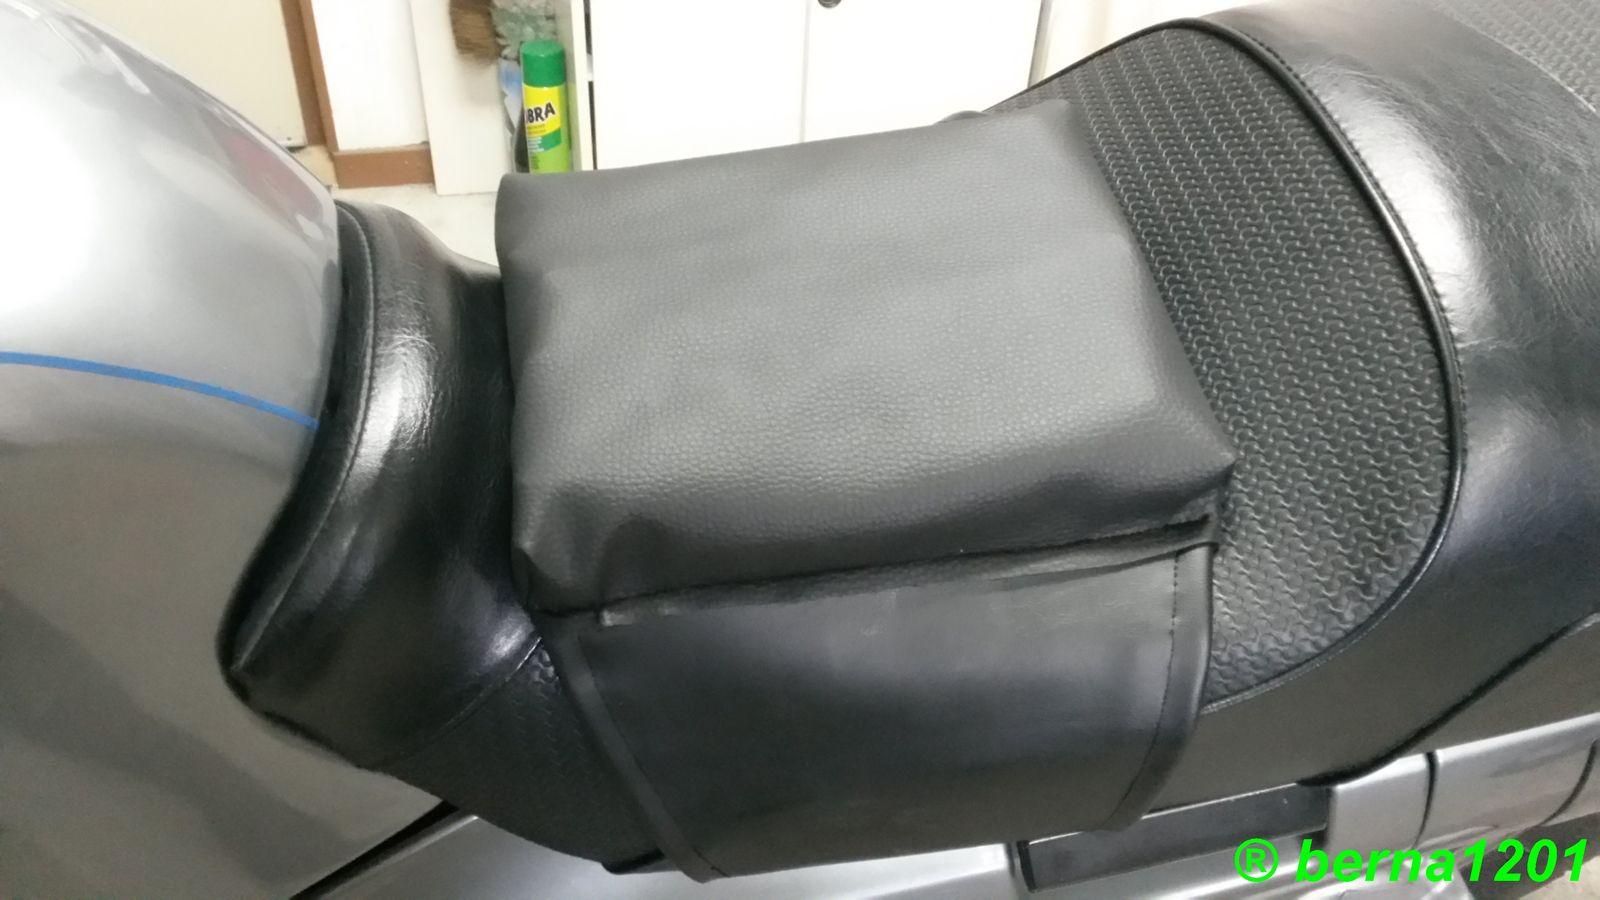 Coussin gonflable pour moto